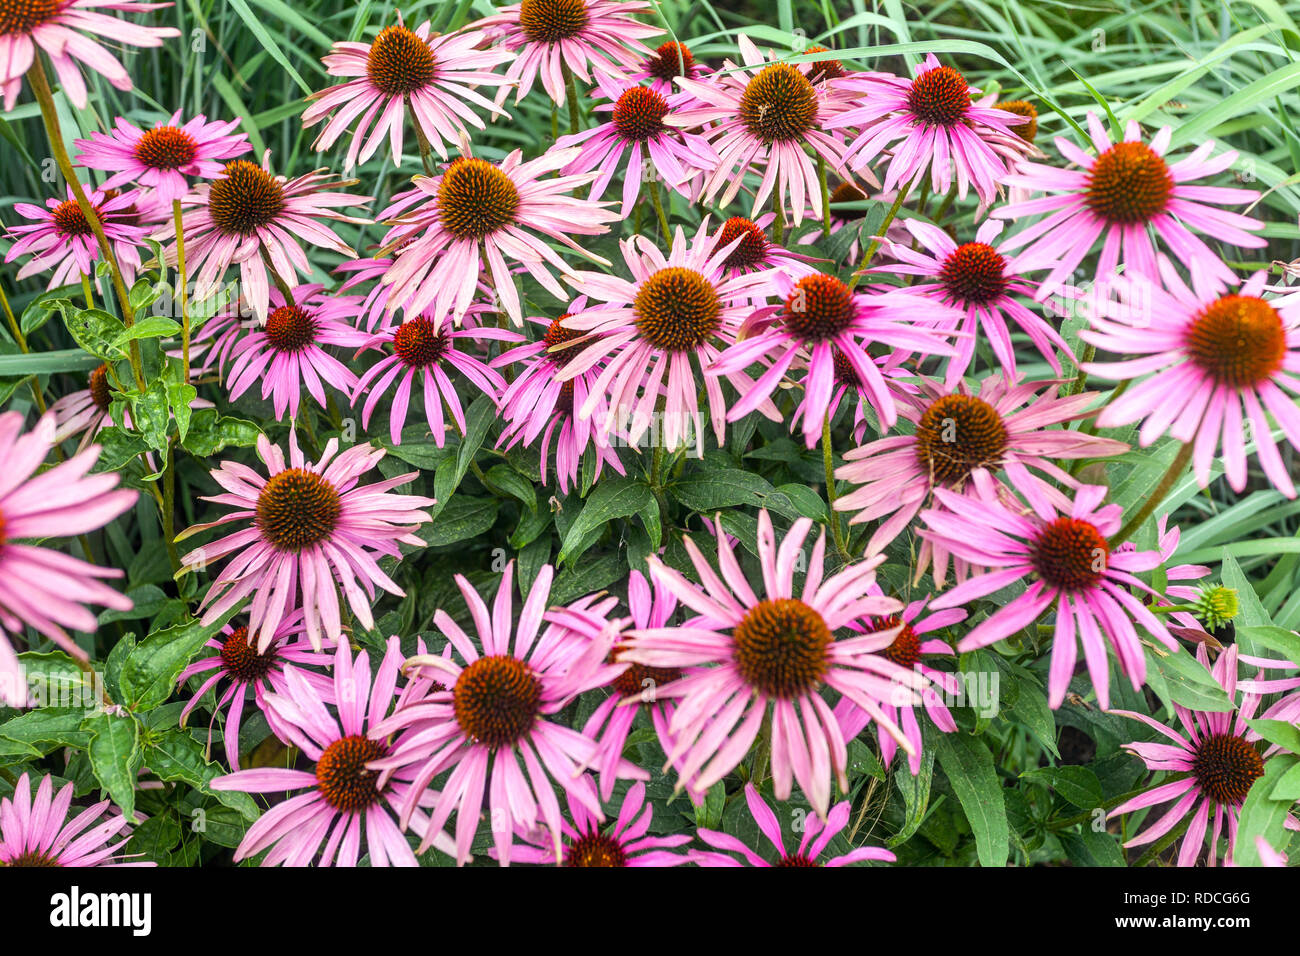 Perennial garden flower border plant, Echinacea - Stock Image